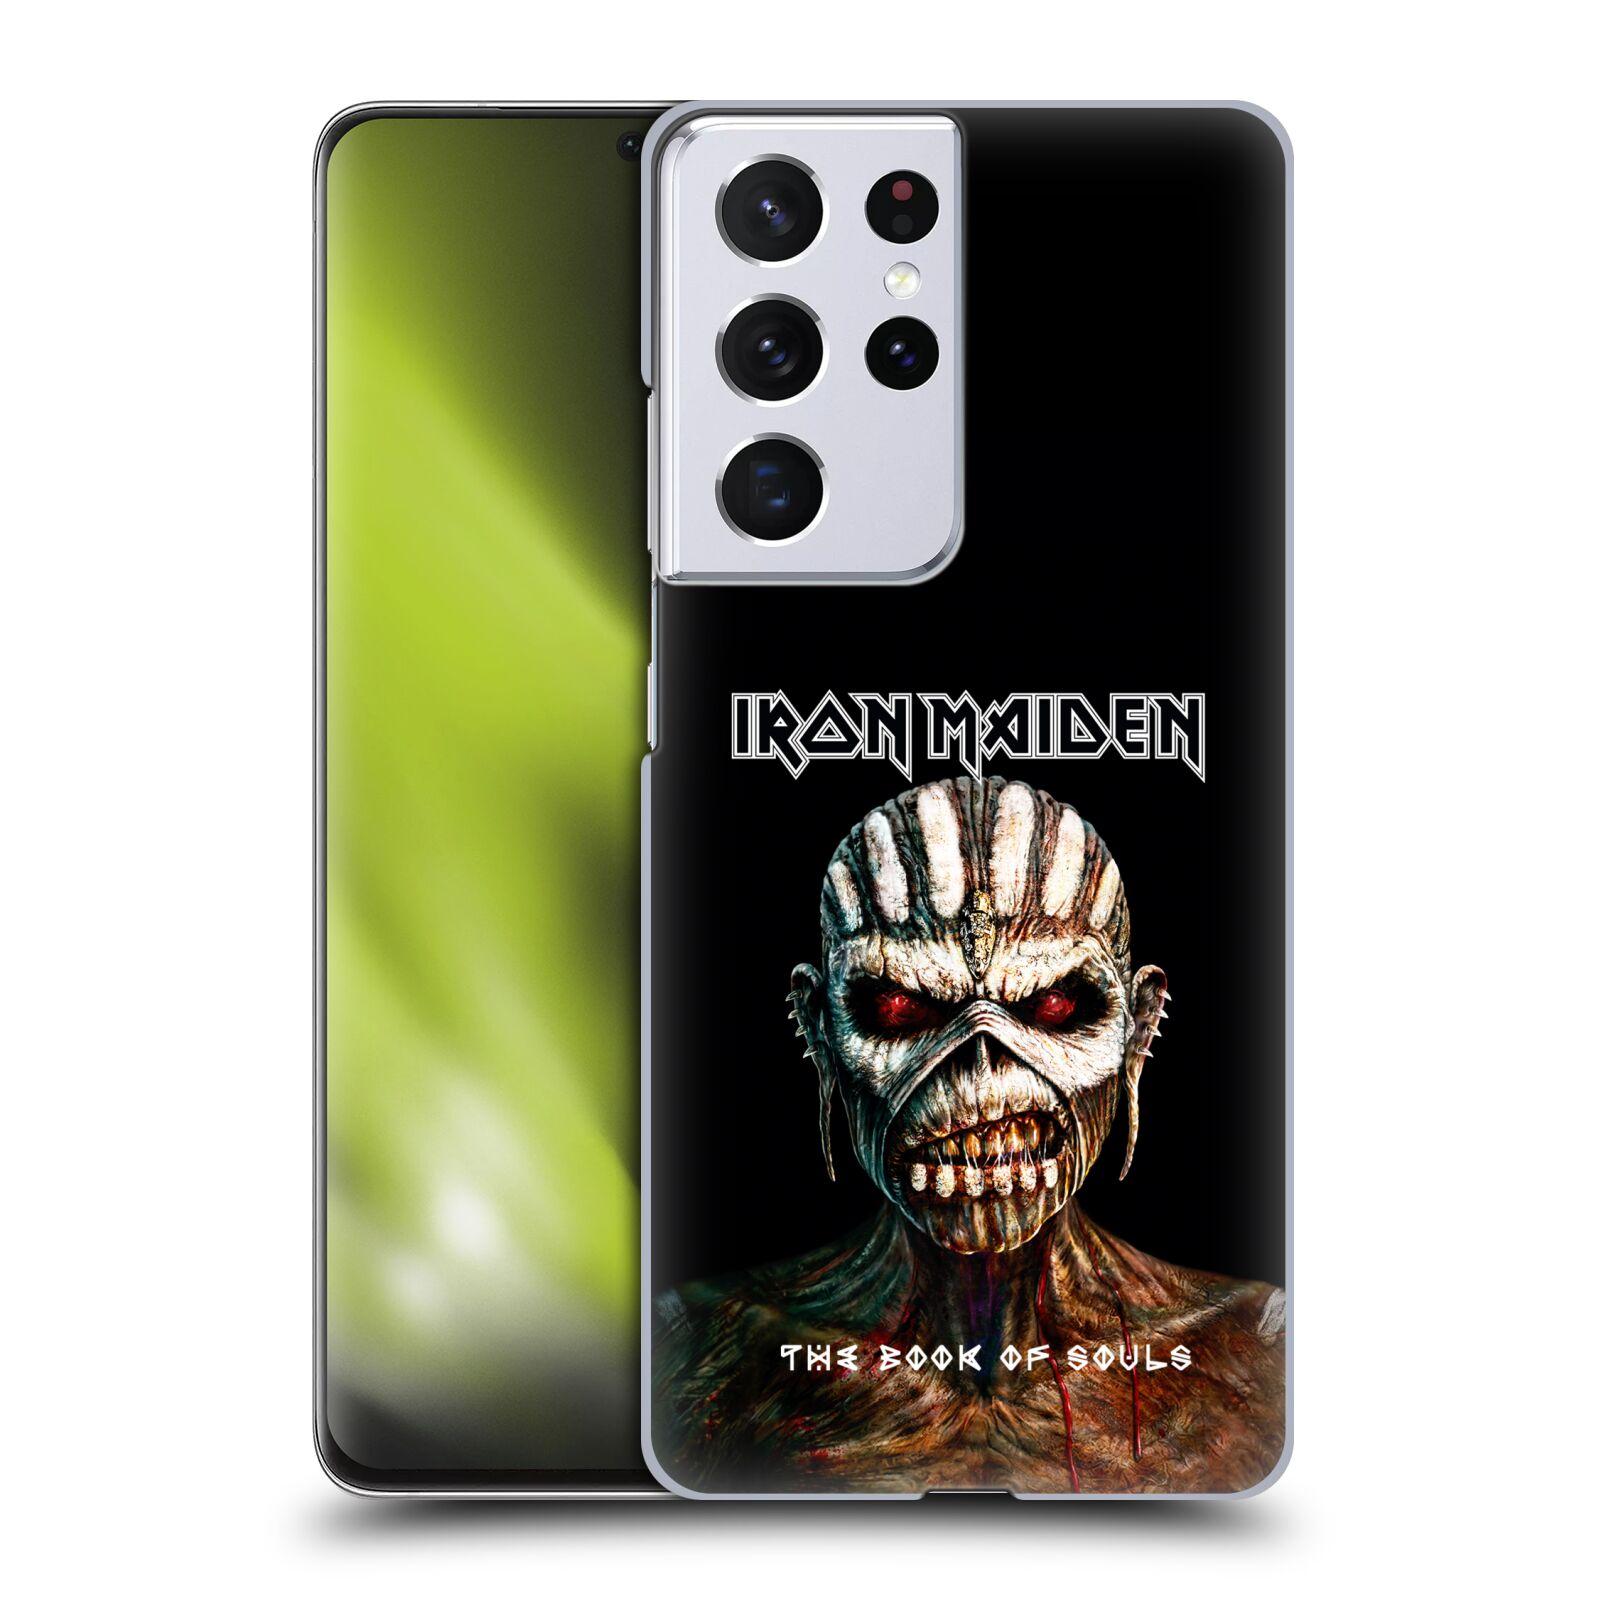 Plastové pouzdro na mobil Samsung Galaxy S21 Ultra 5G - Head Case - Iron Maiden - The Book Of Souls